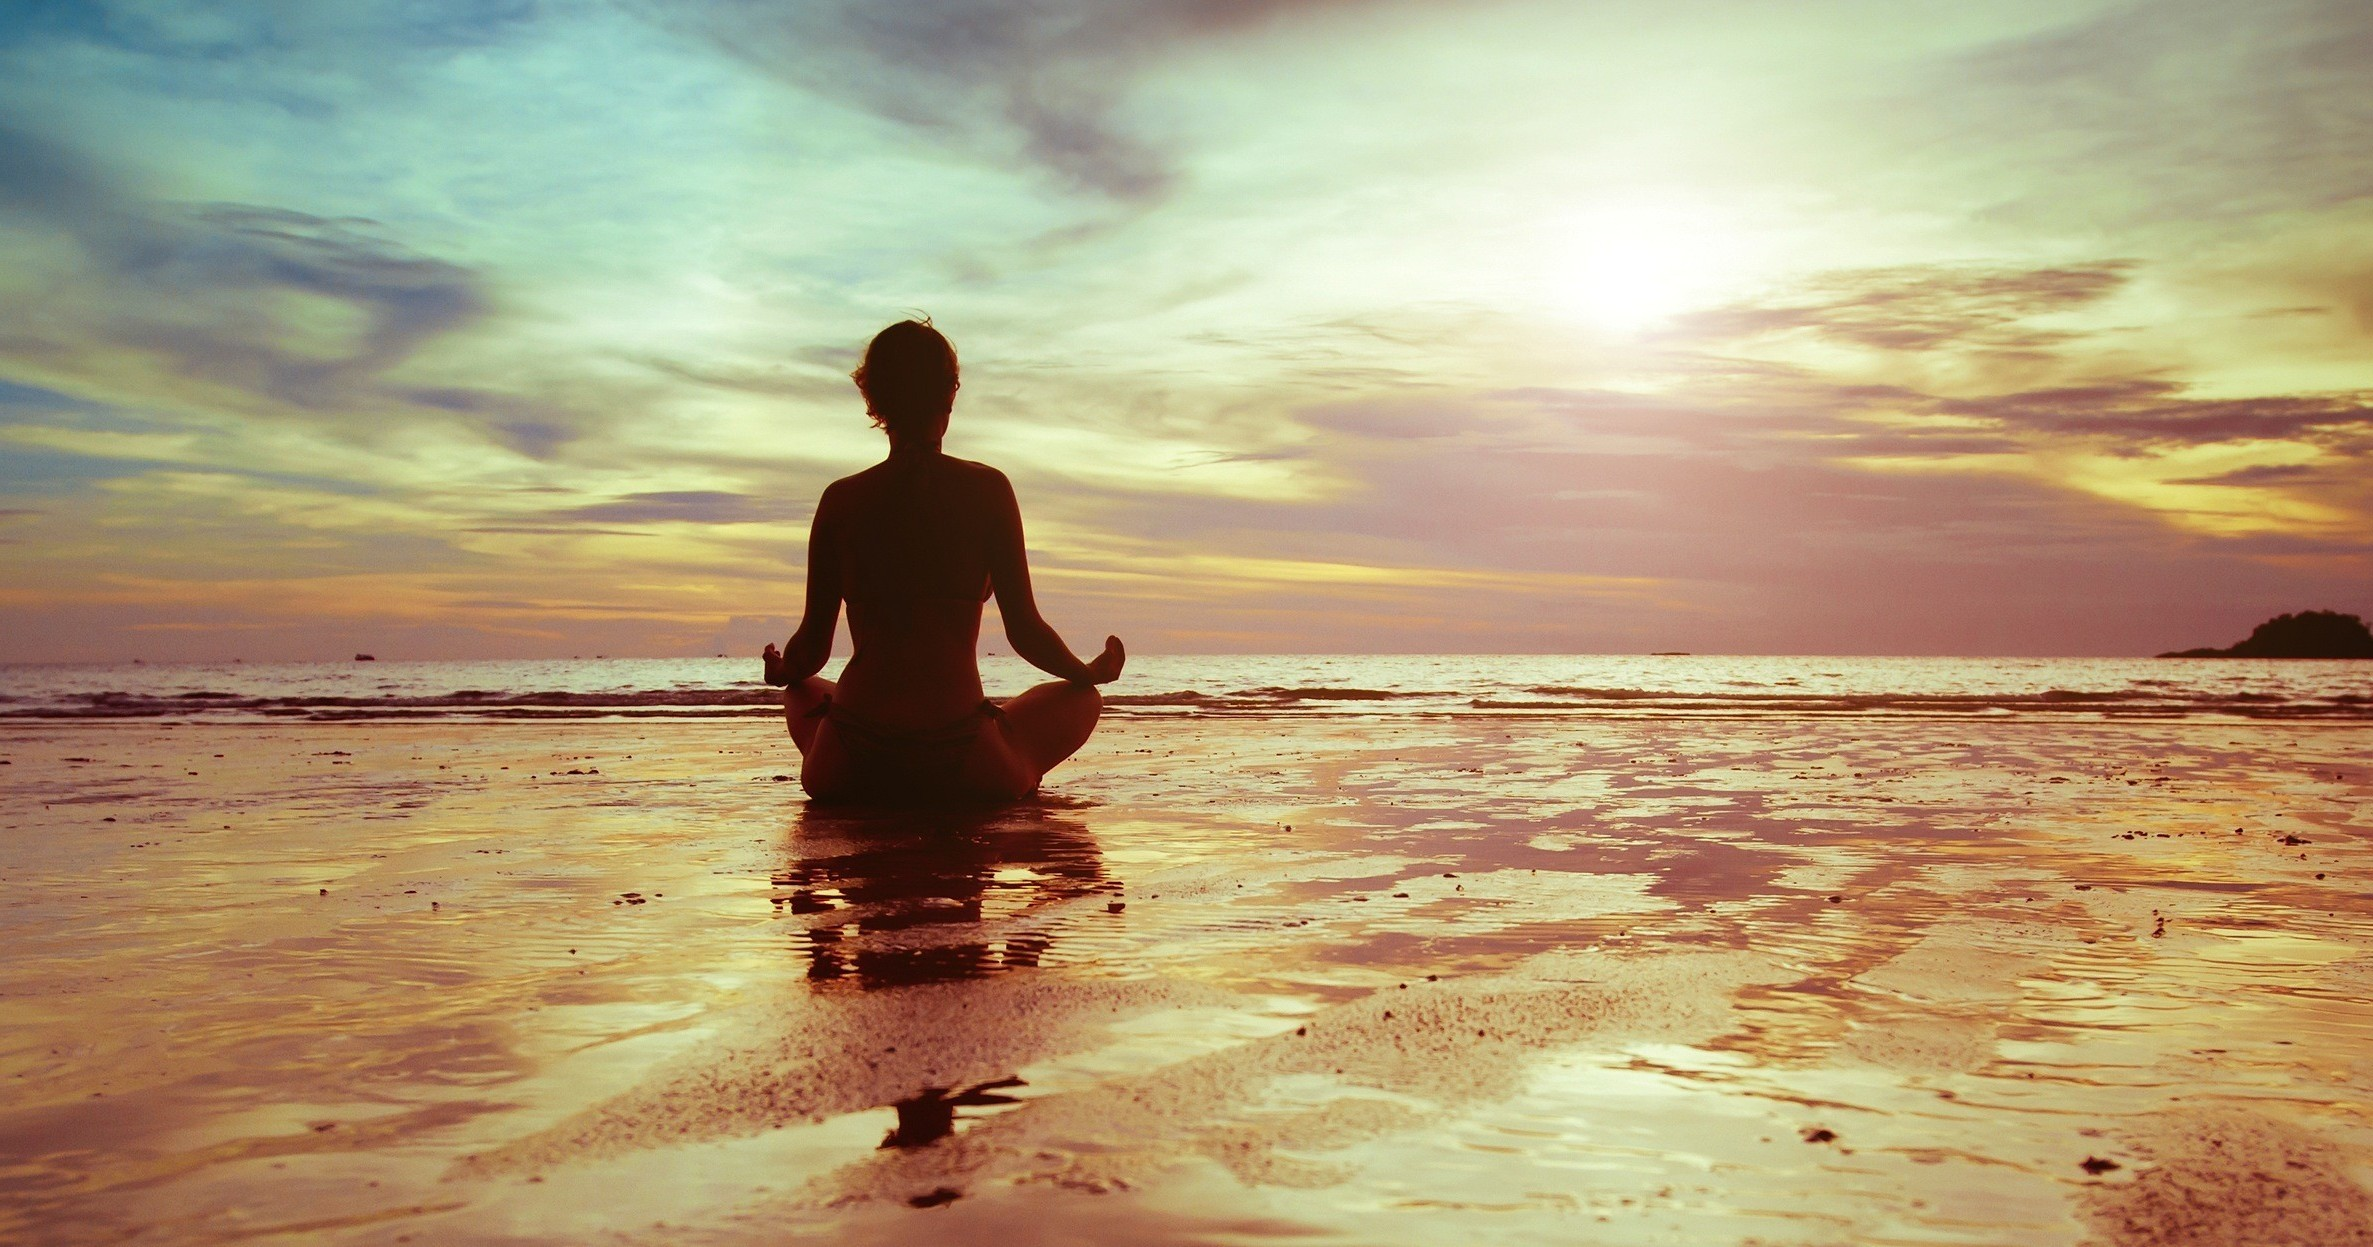 Meditation Wallpaper (73+ pictures)